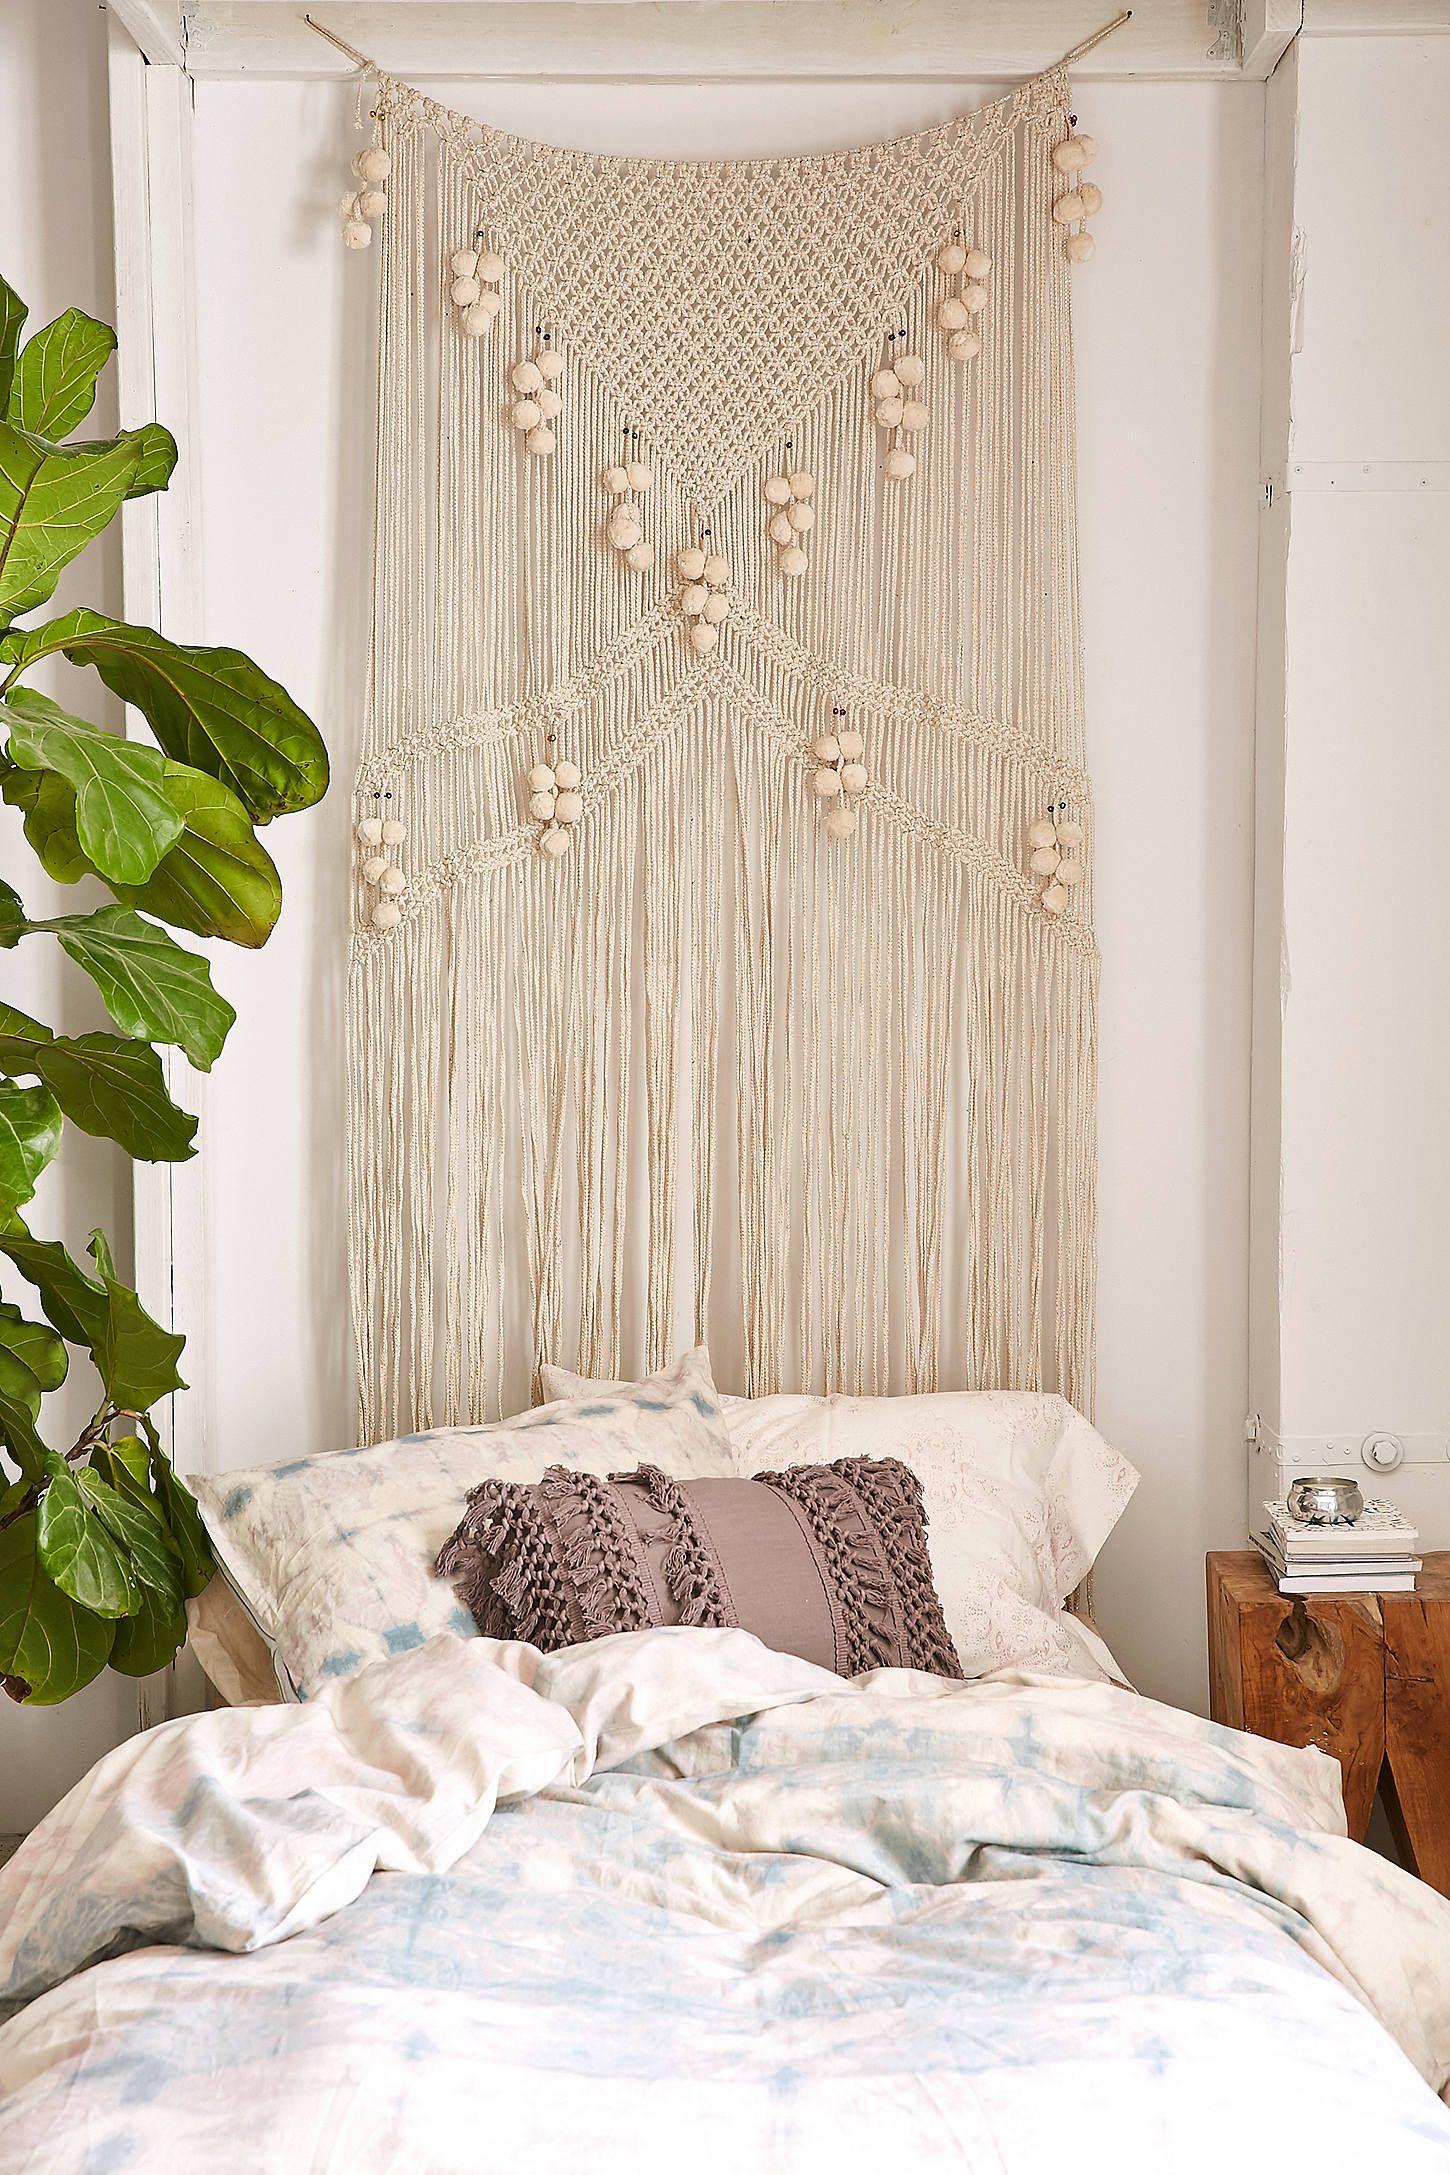 rideau en macram m tallique meda d co pinterest parement mural macram et deco. Black Bedroom Furniture Sets. Home Design Ideas